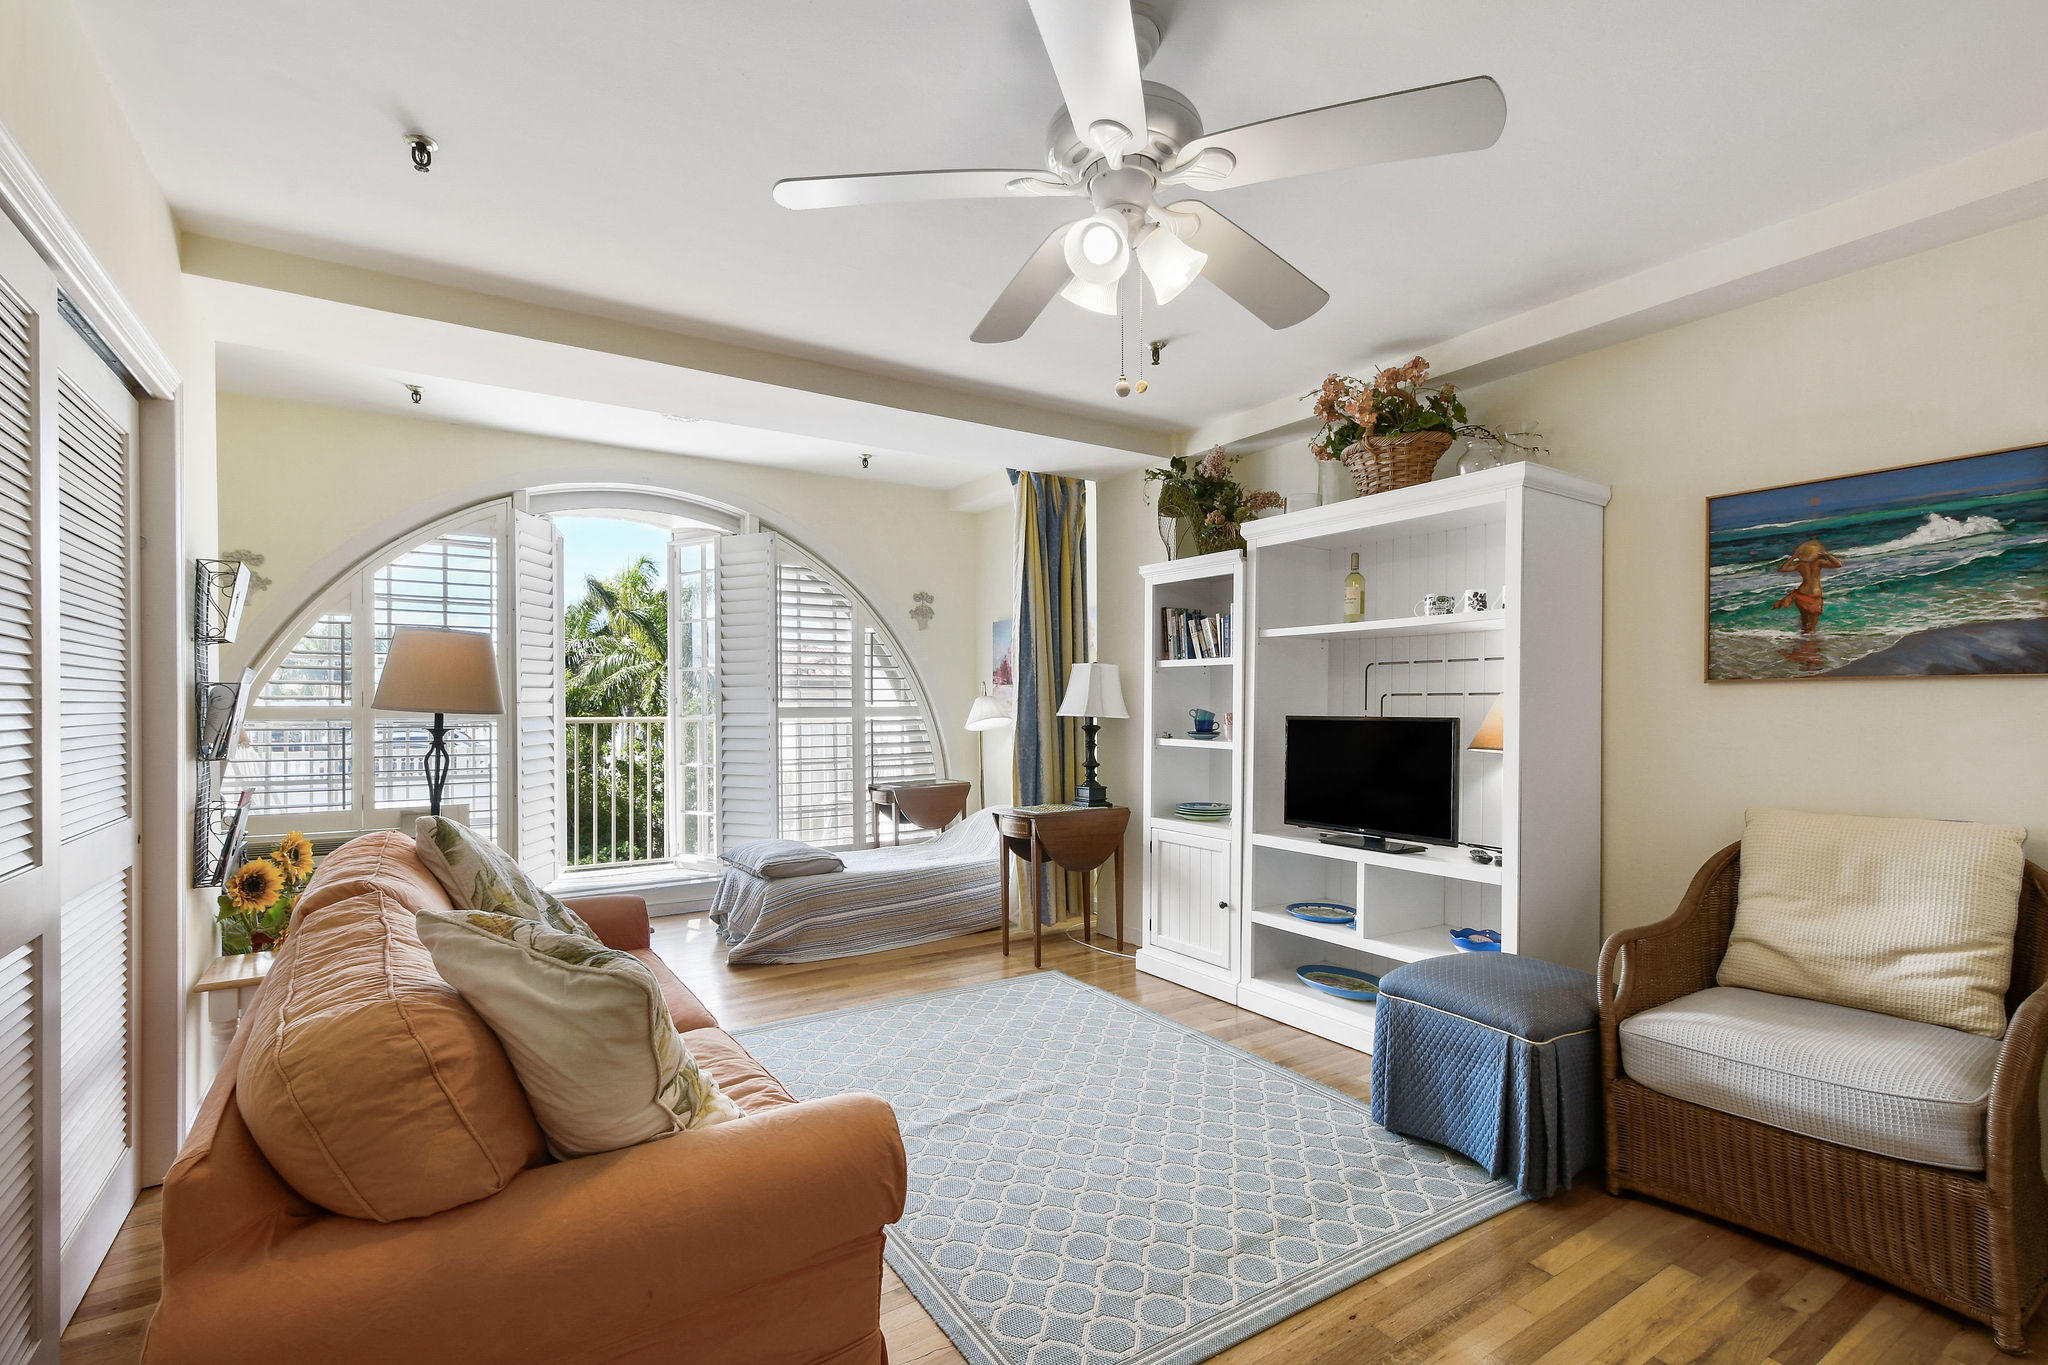 235  Sunrise Avenue 2027 For Sale 10682216, FL